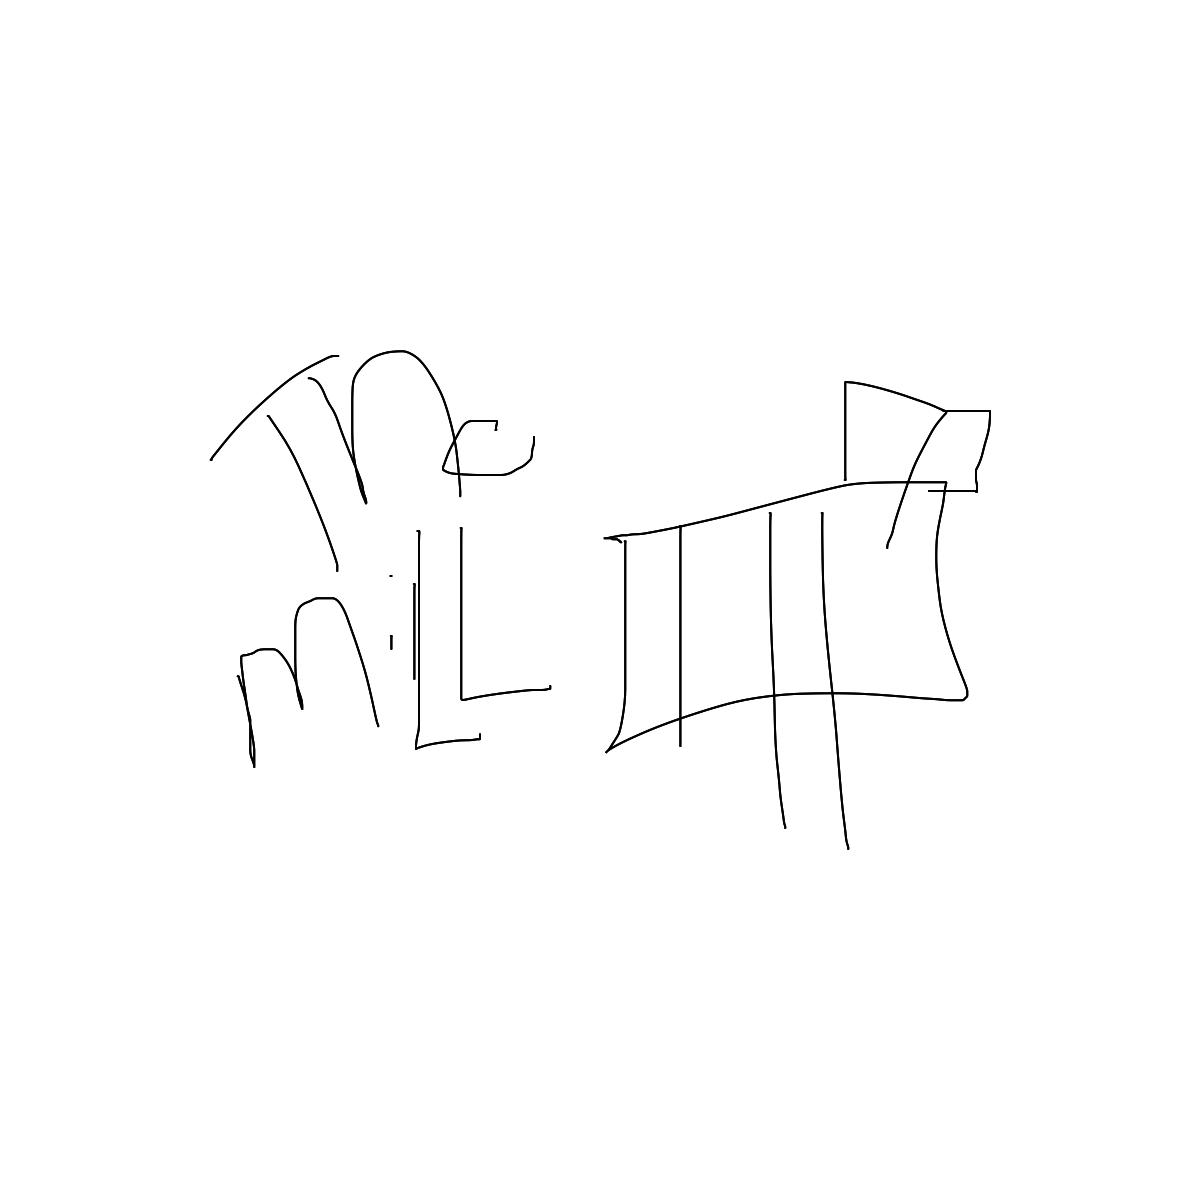 BAAAM drawing#1590 lat:51.5188255310058600lng: -0.1338175833225250